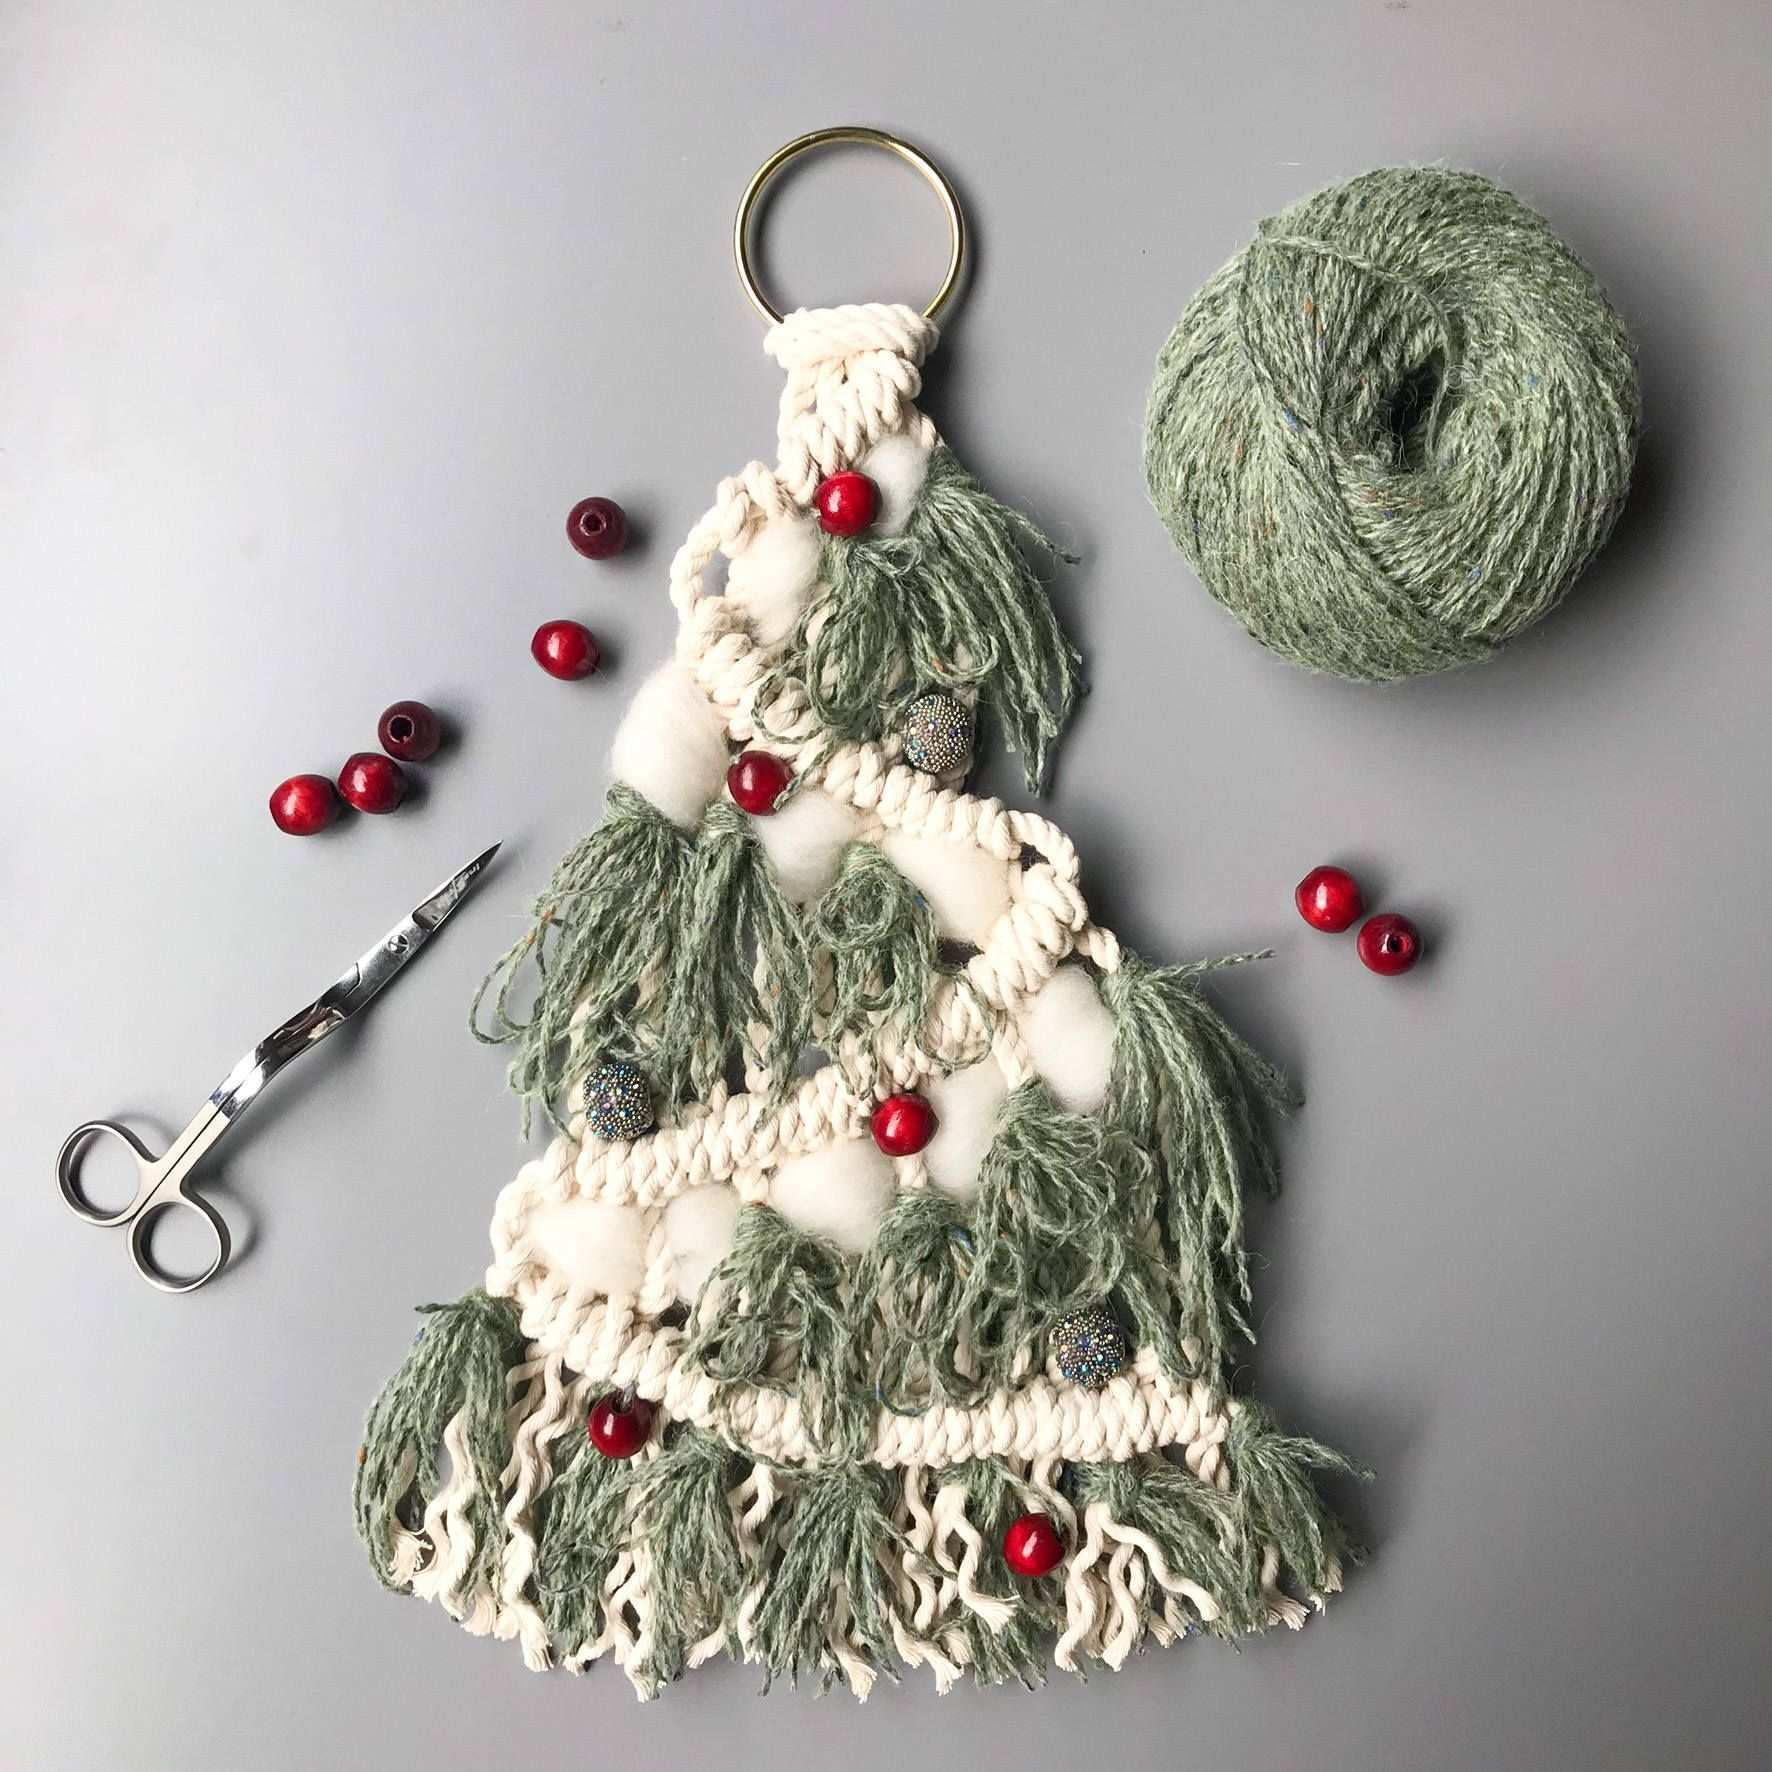 Hangendes Makramee Weihnachtsbaum Muster Anfanger Diy Projekt Perfekt Fur Ihre O Macrame Patterns Christmas Tree Pattern Macrame Wall Hanging Patterns